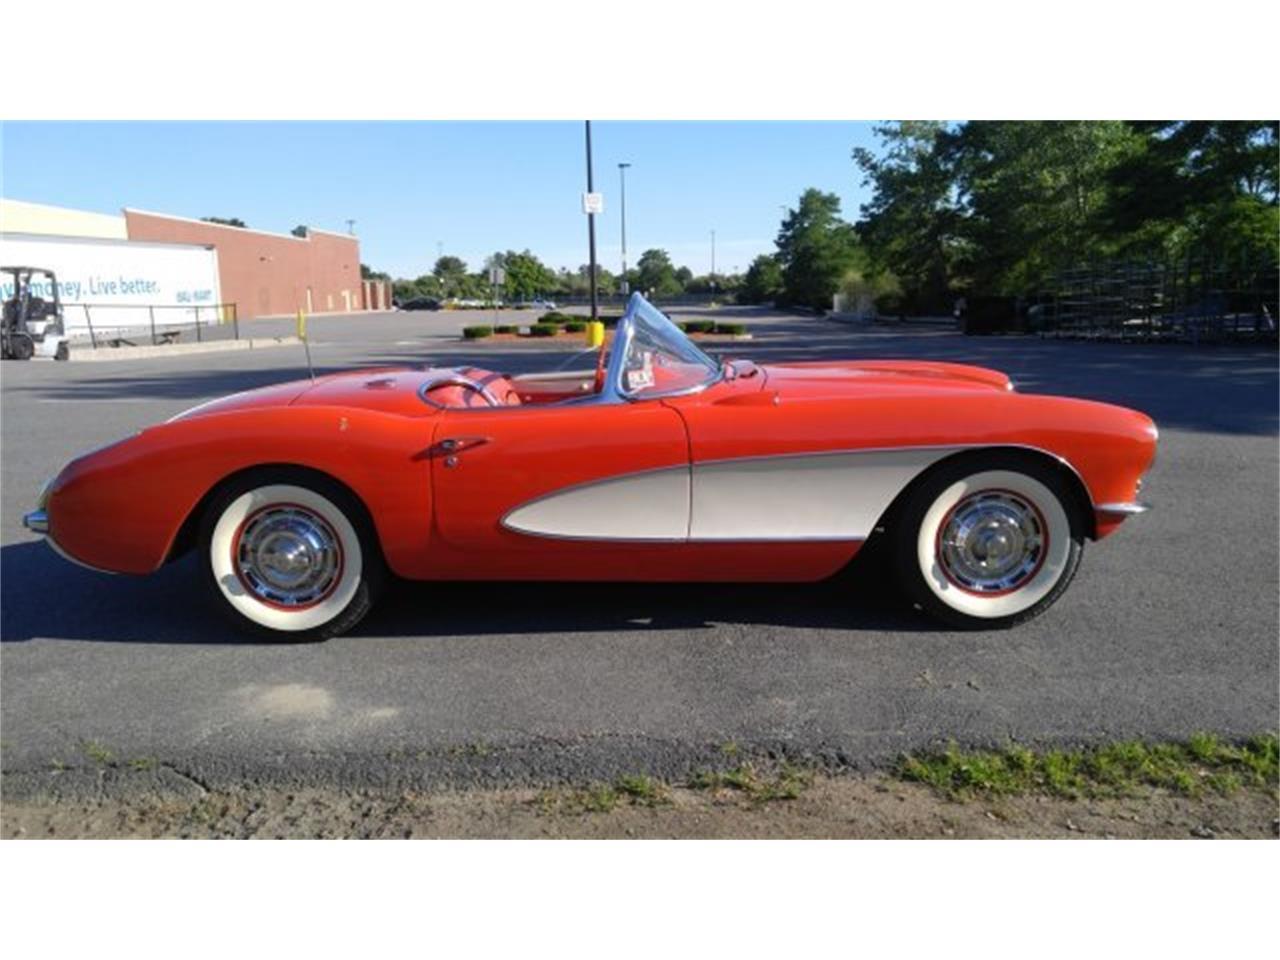 Large Picture of 1956 Corvette located in Hanover Massachusetts - $59,500.00 - K3QK